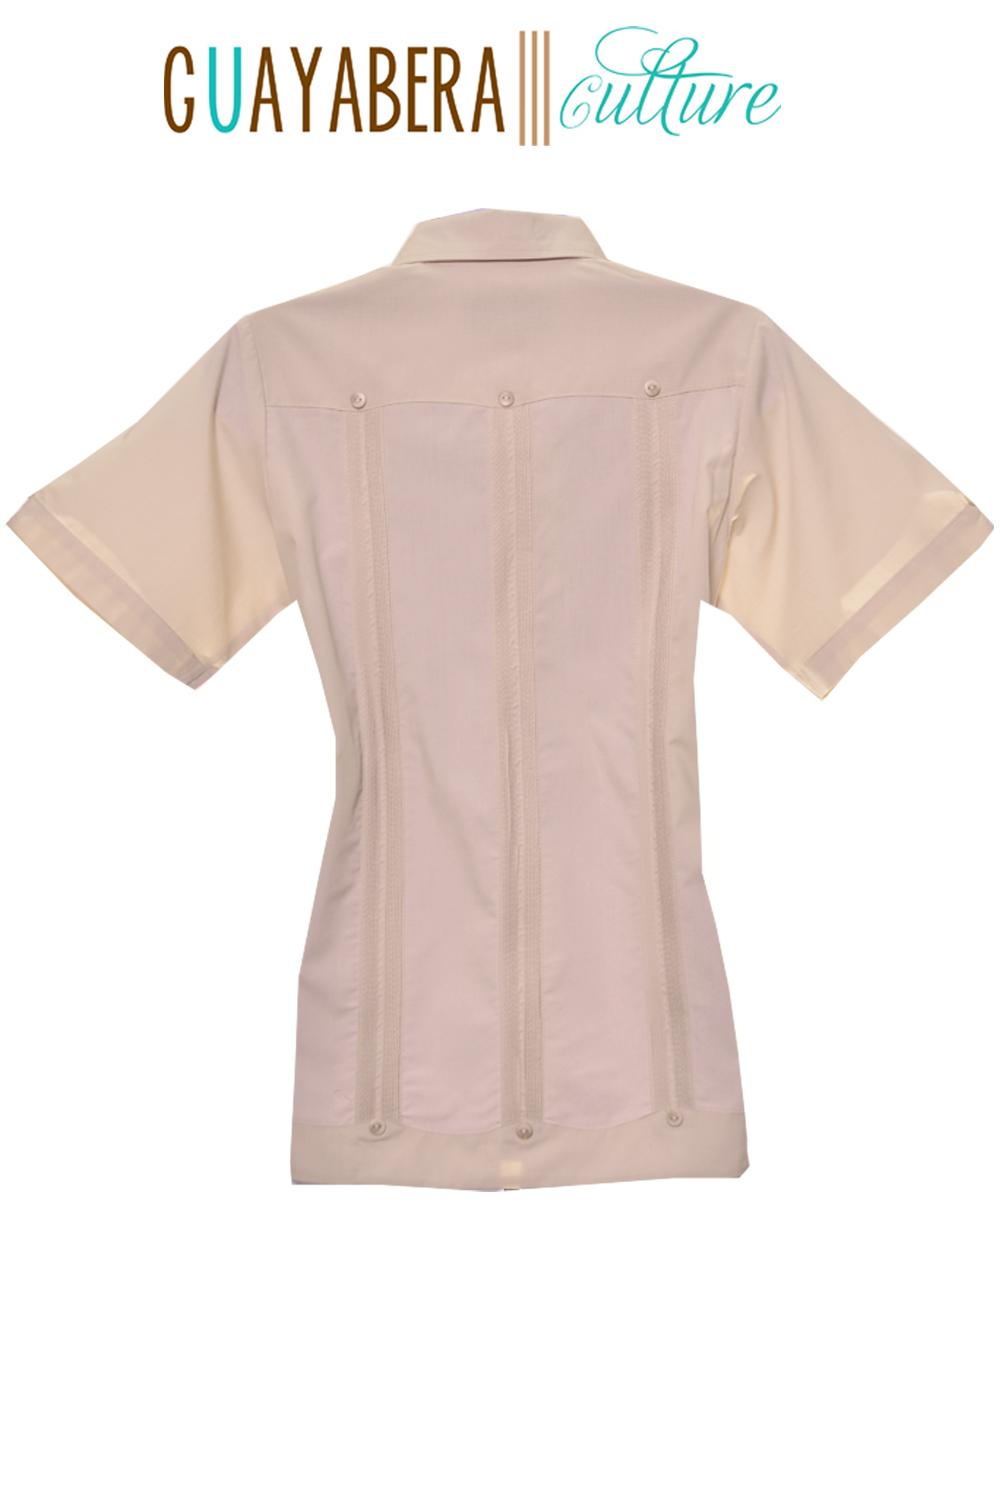 traditional short sleeve ladies guayabera guayabera culture